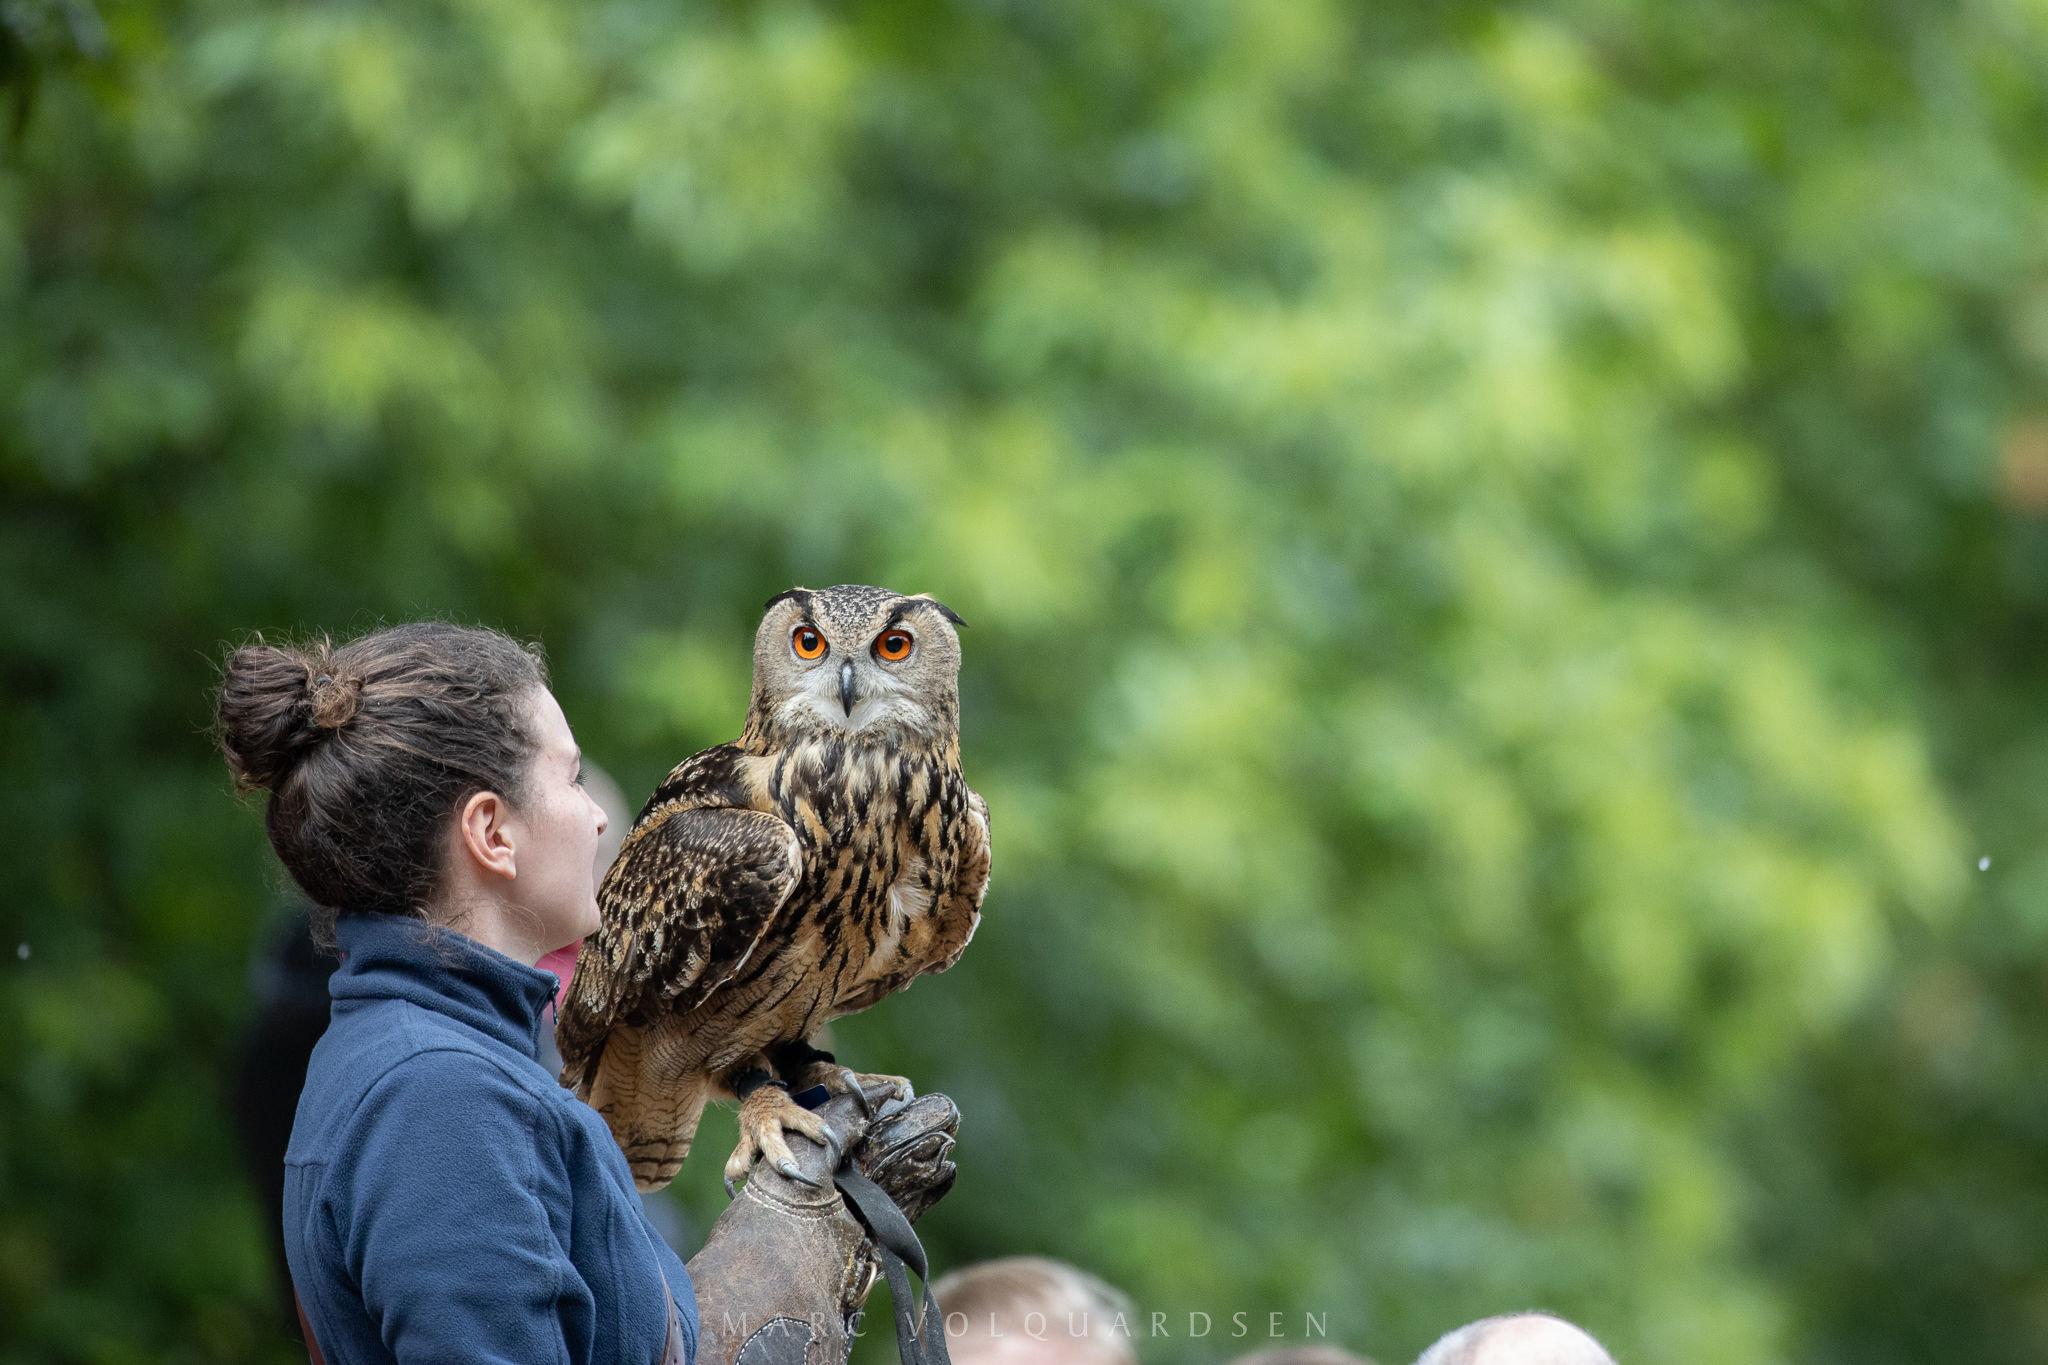 Wildlife Park Schwarze Berge - Owl outraged (0502)